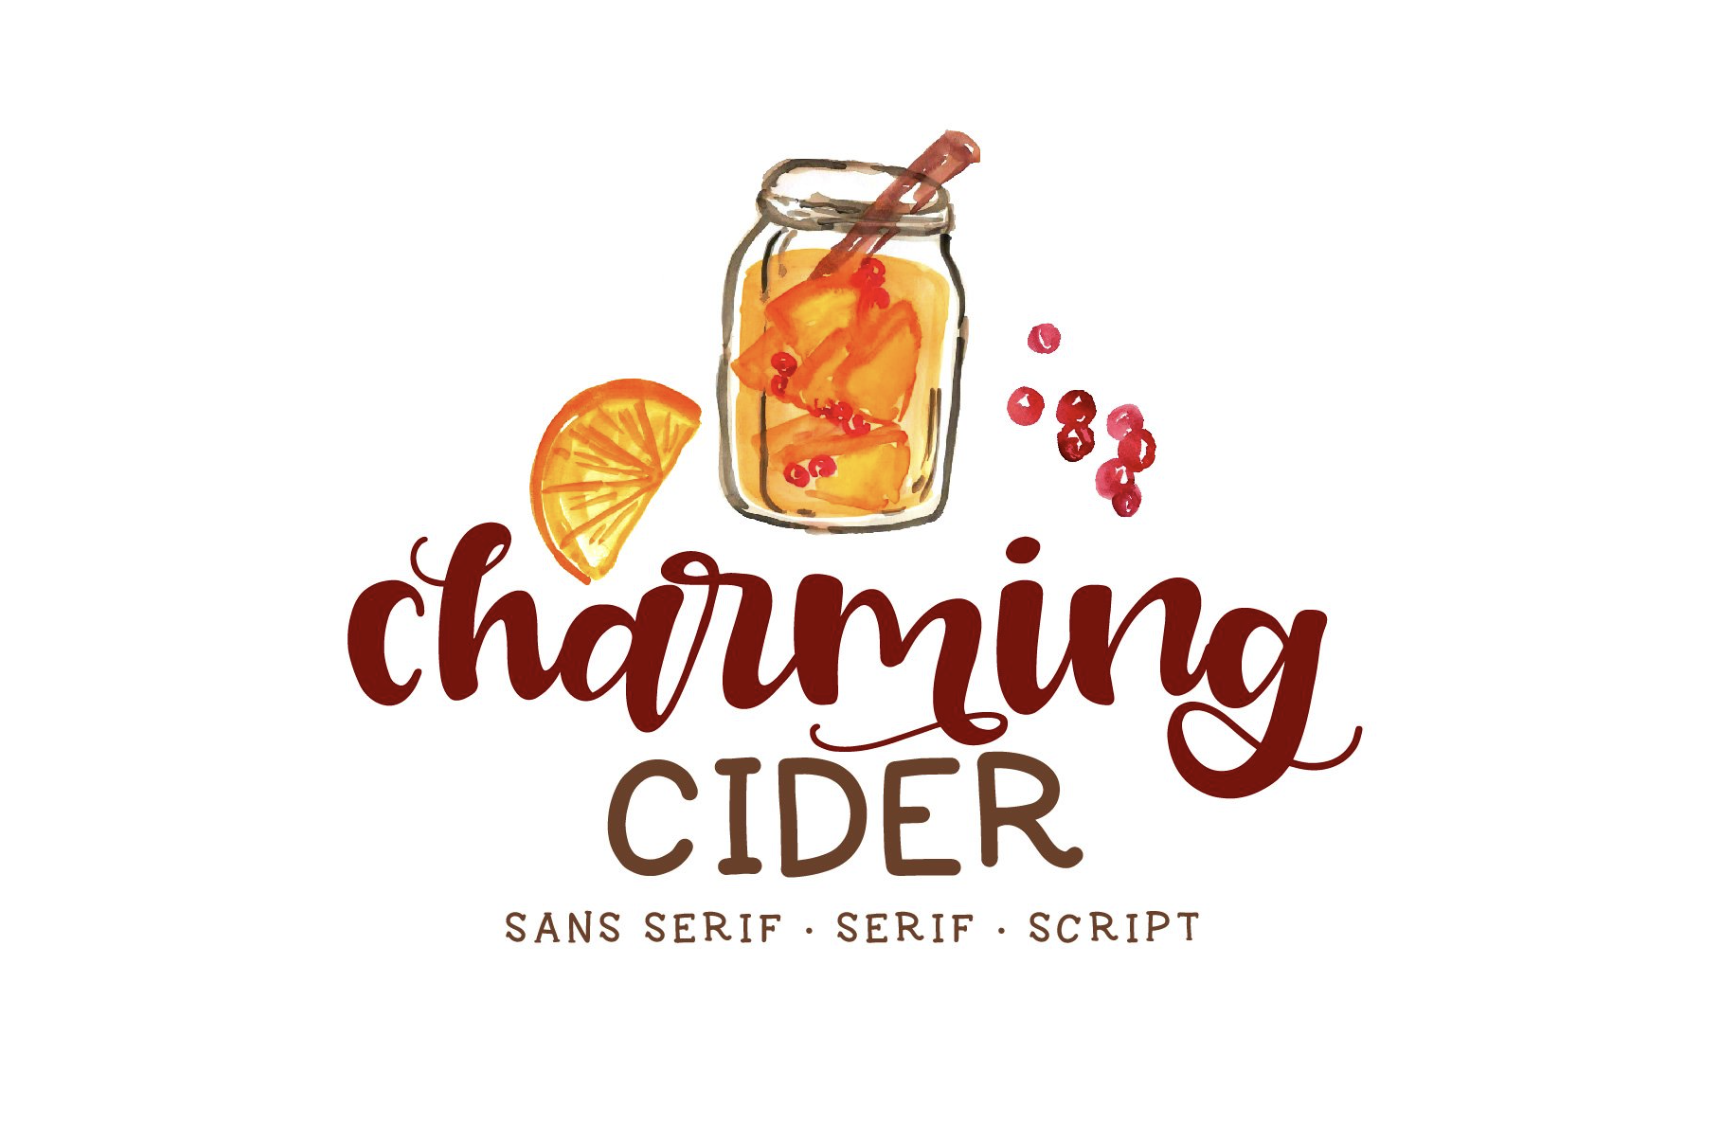 Charming Cider